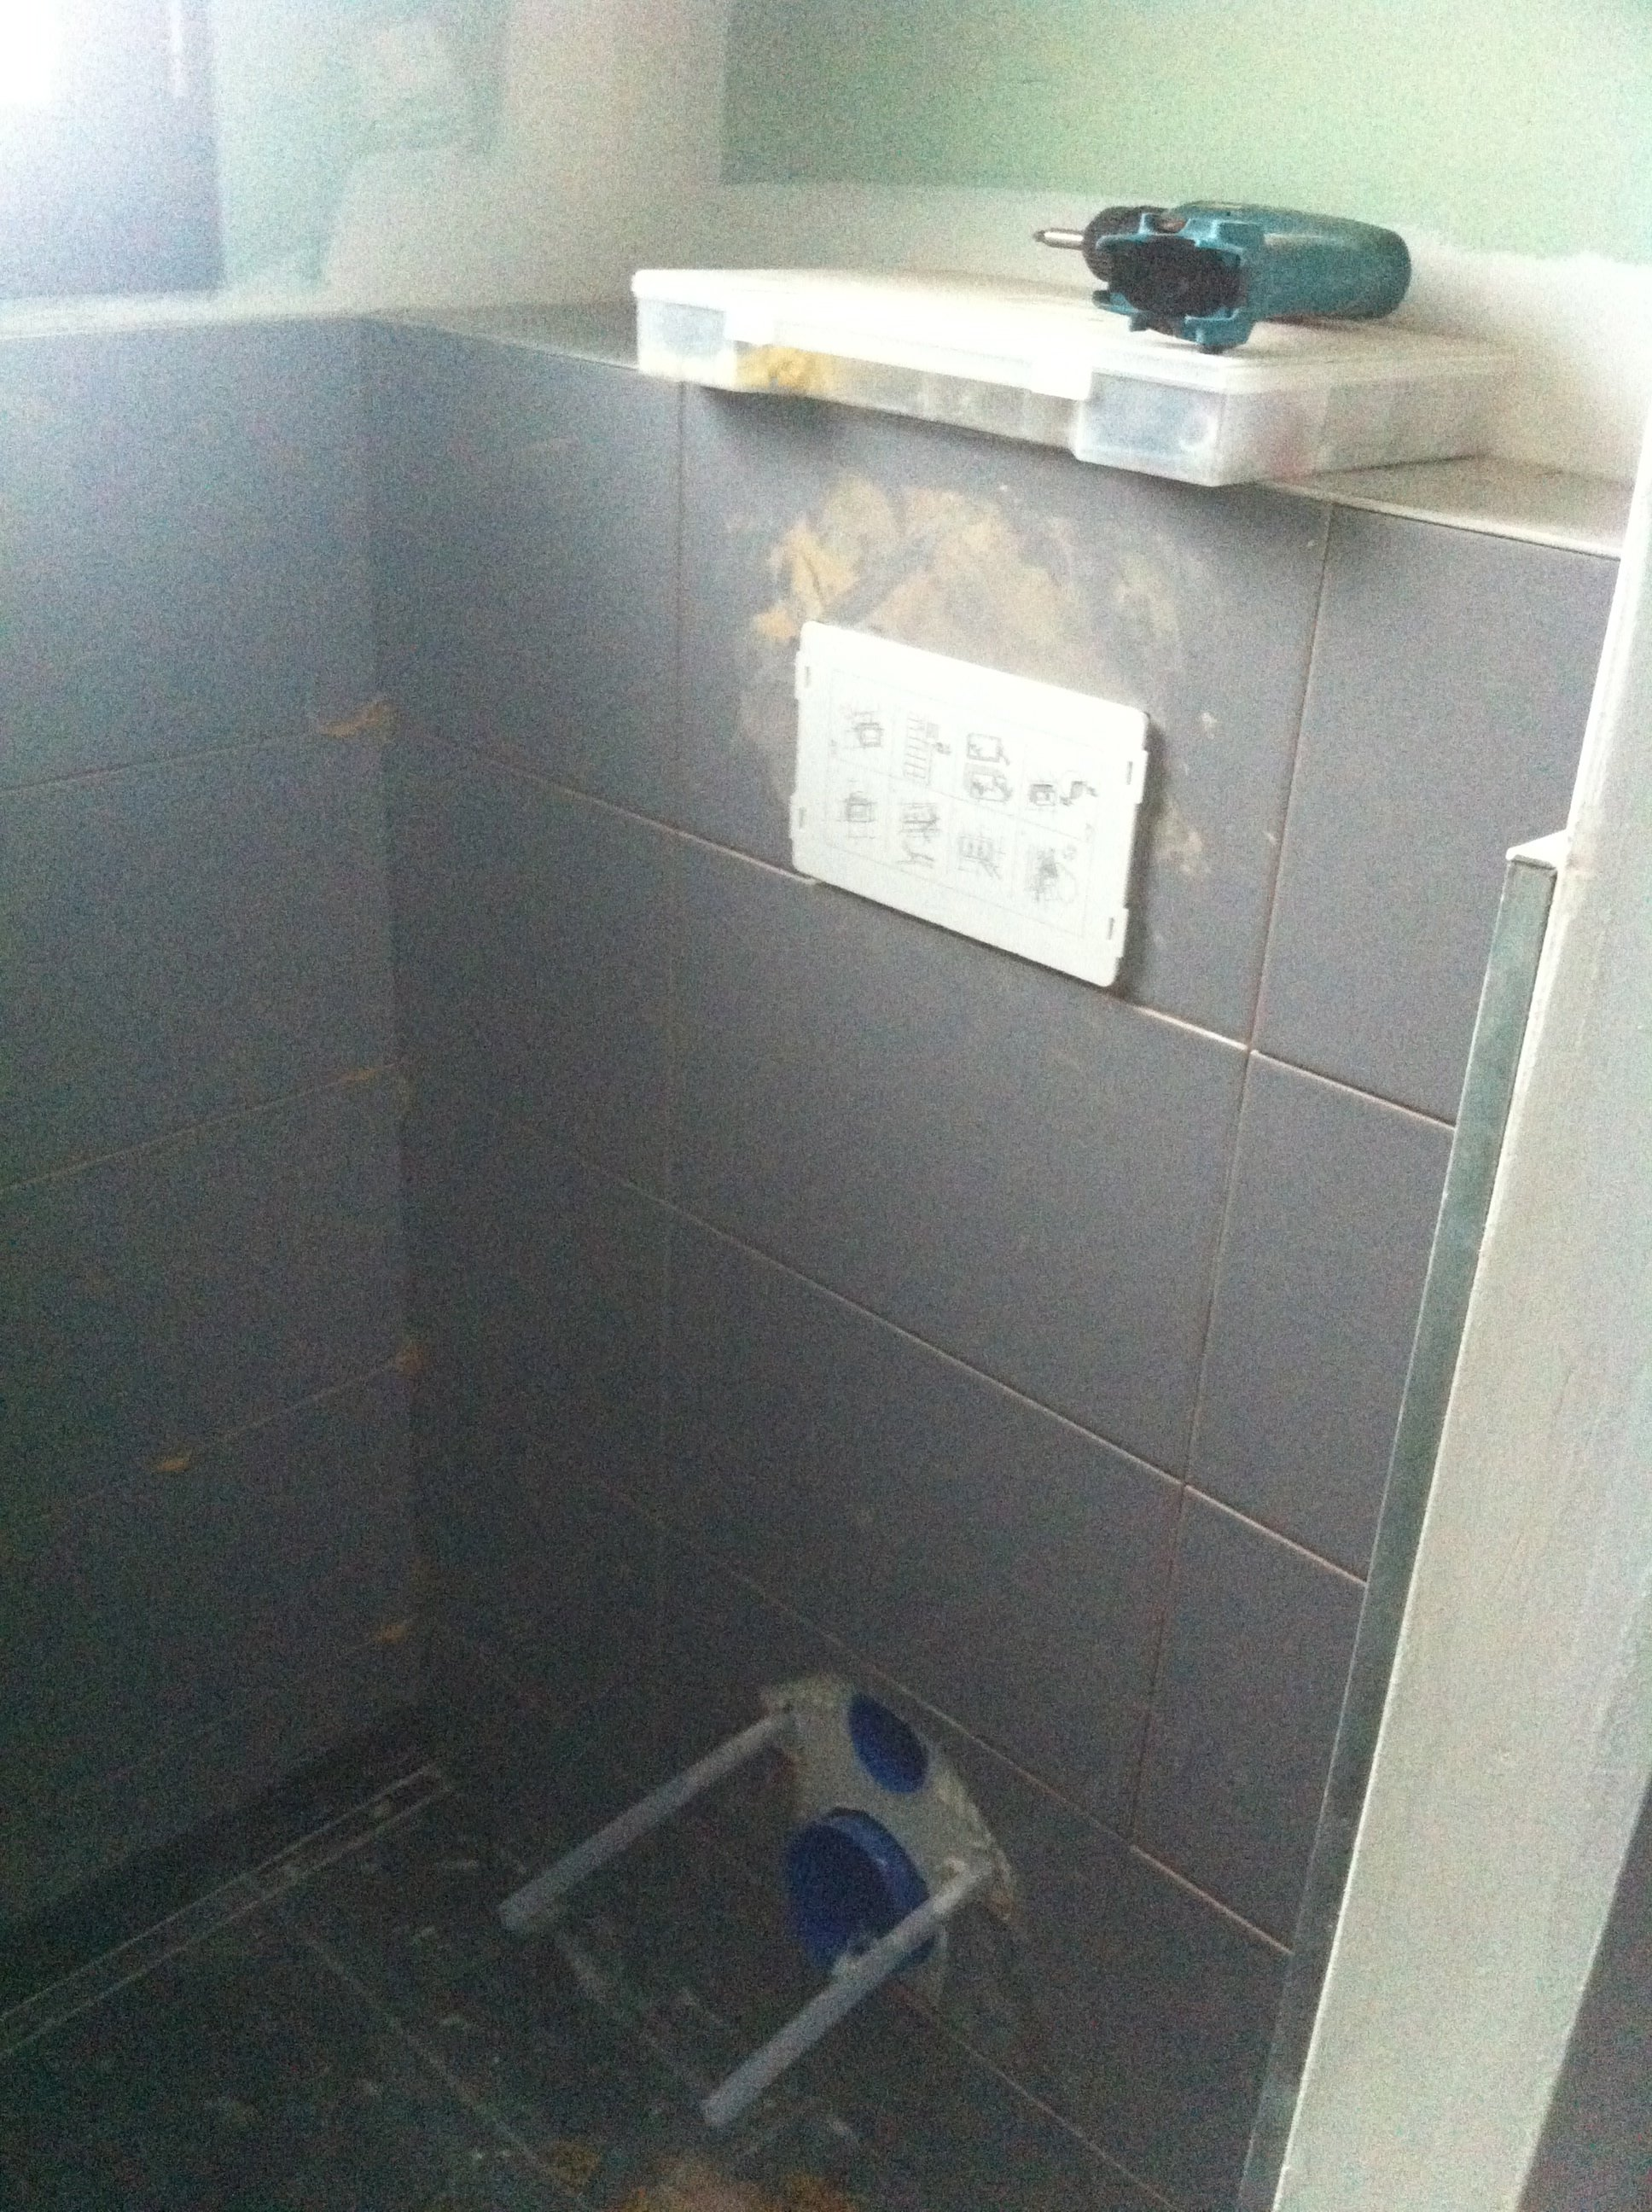 Chezalexetnico fin de la fa ence wc - Wc faience ...